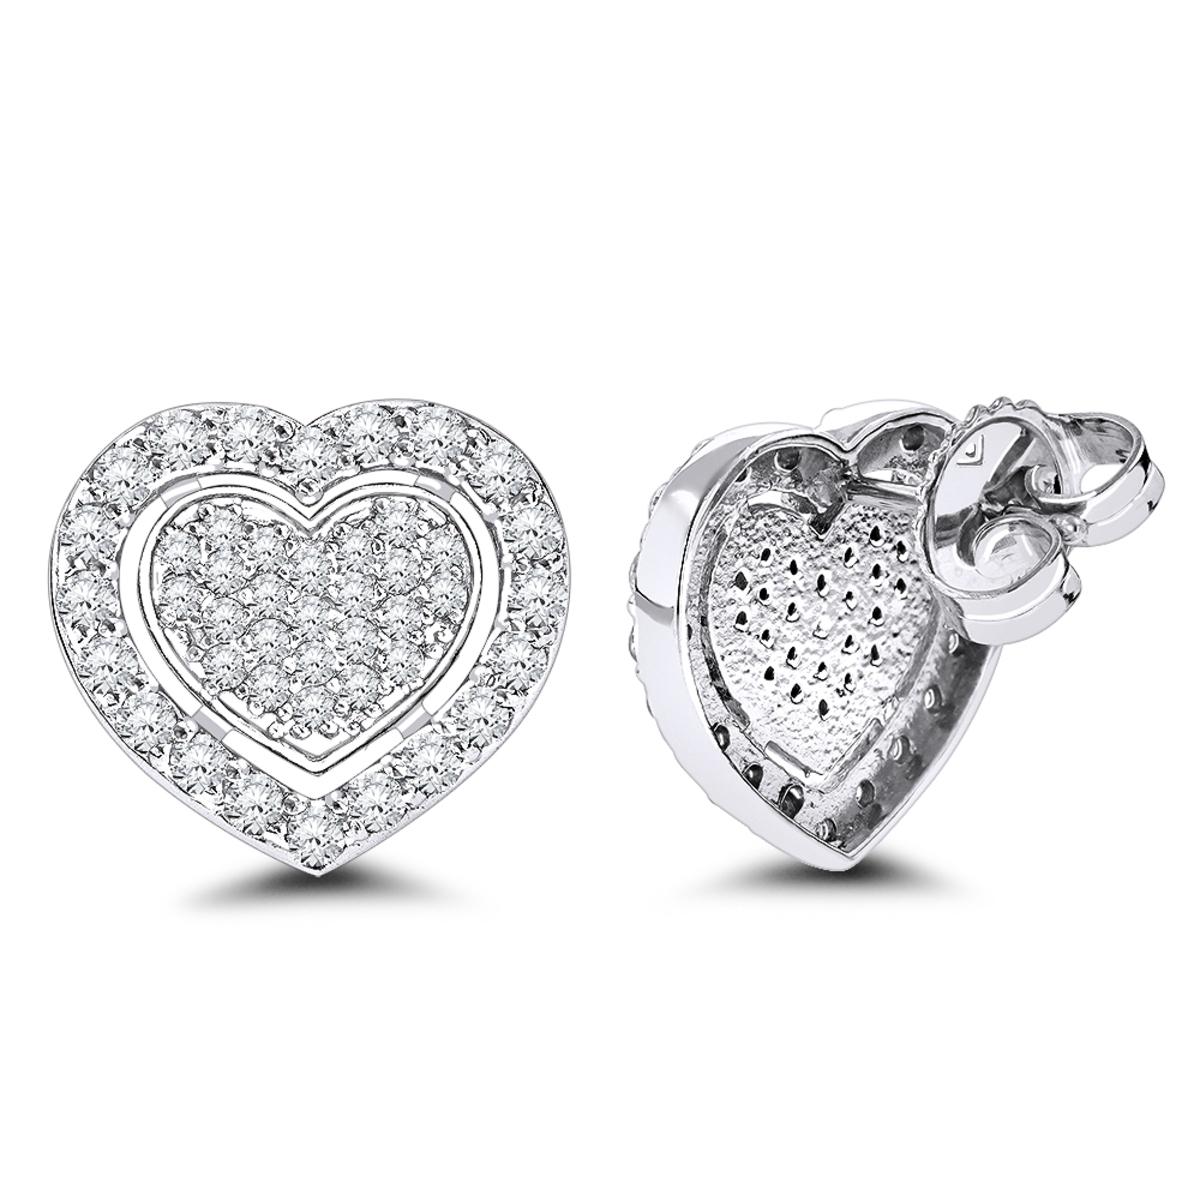 Luxurman Platinum Diamond Heart Earrings Studs 0.5ctw